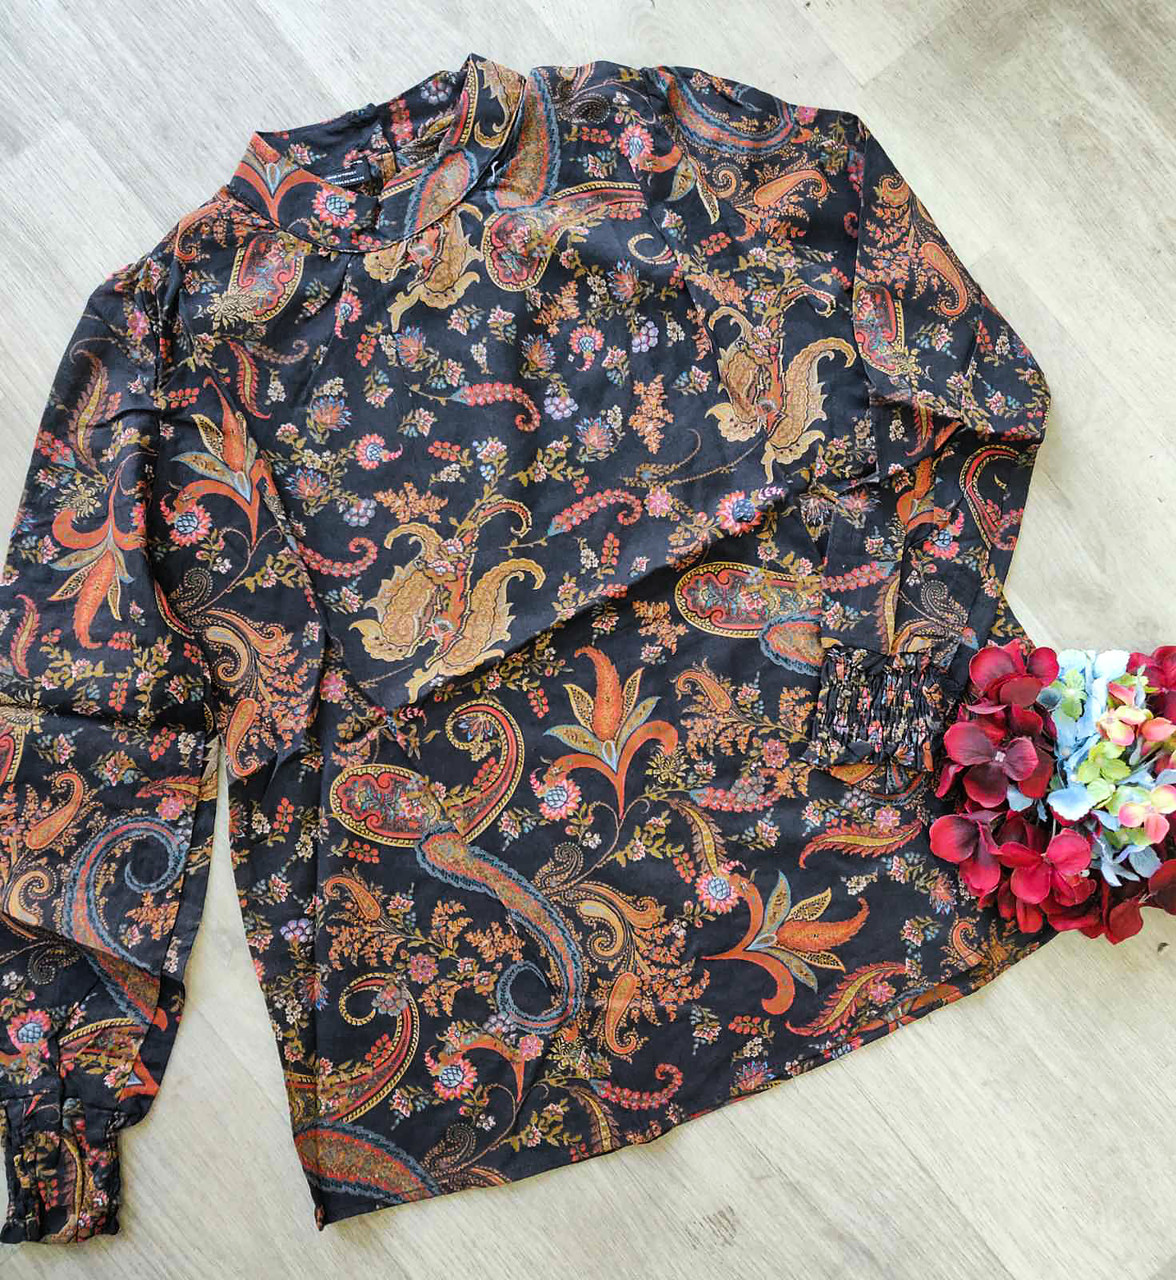 Женская закрытая блуза с узорами (48-50)